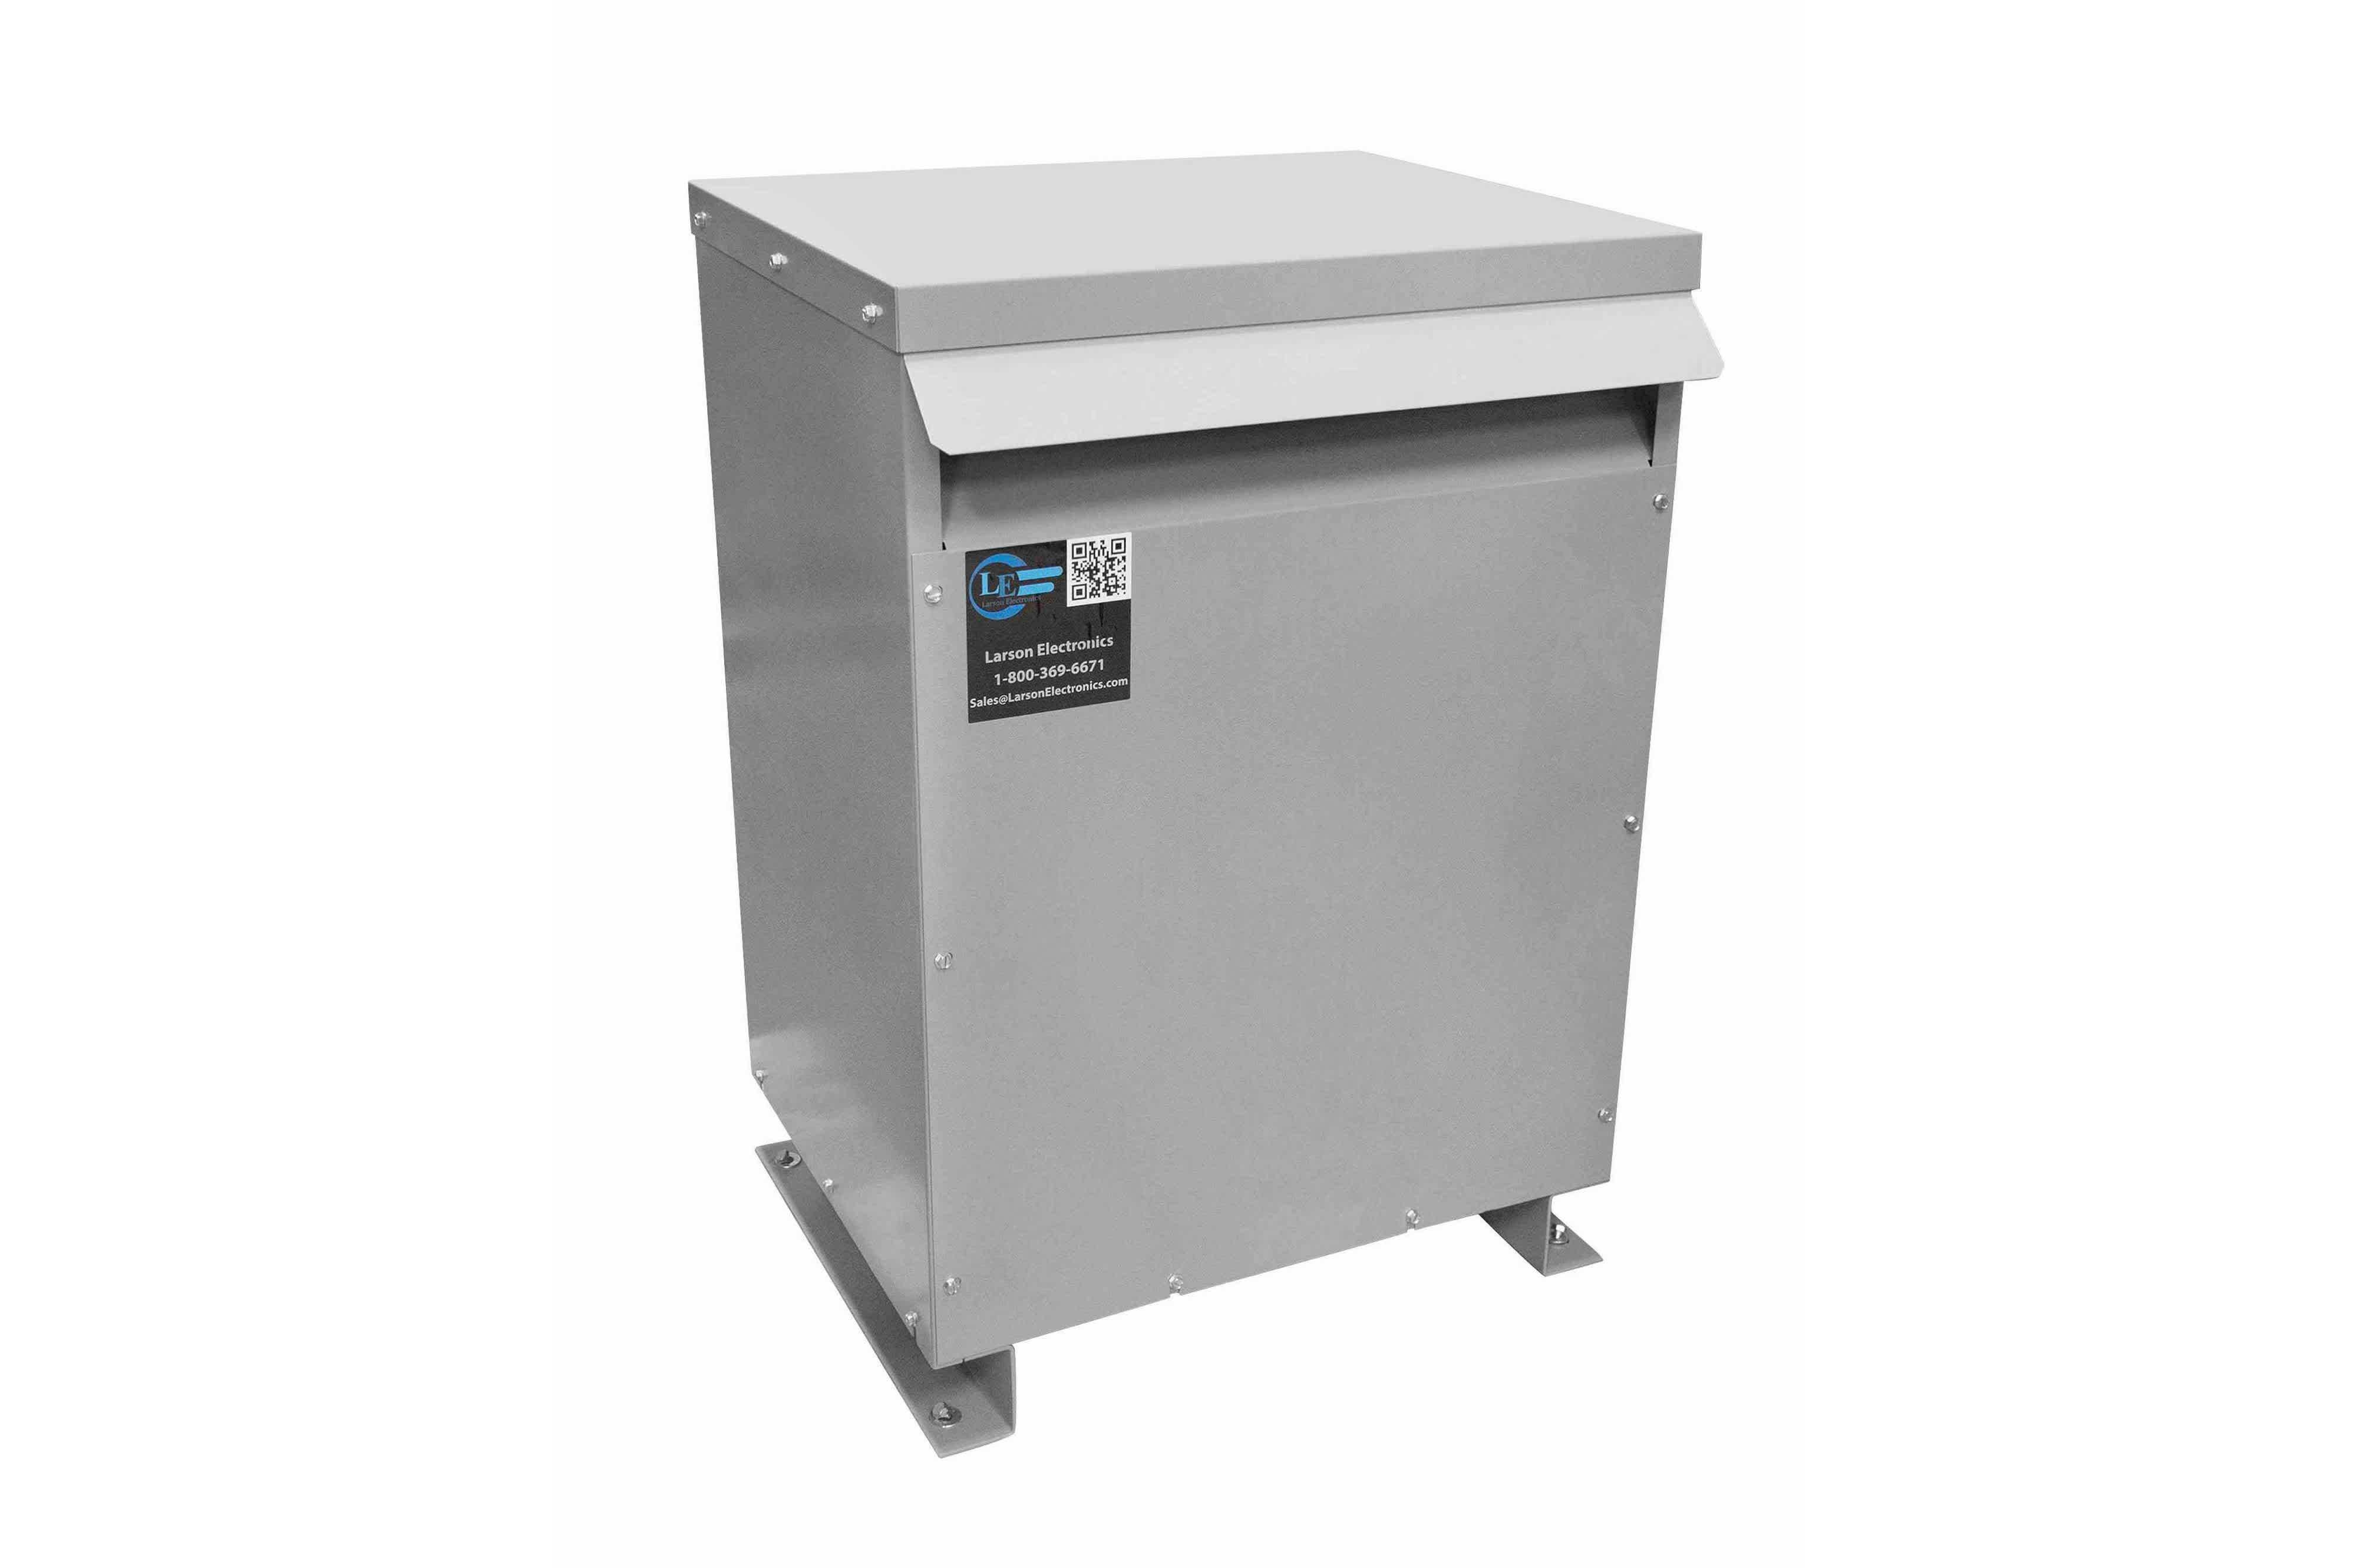 52.5 kVA 3PH Isolation Transformer, 415V Wye Primary, 600Y/347 Wye-N Secondary, N3R, Ventilated, 60 Hz